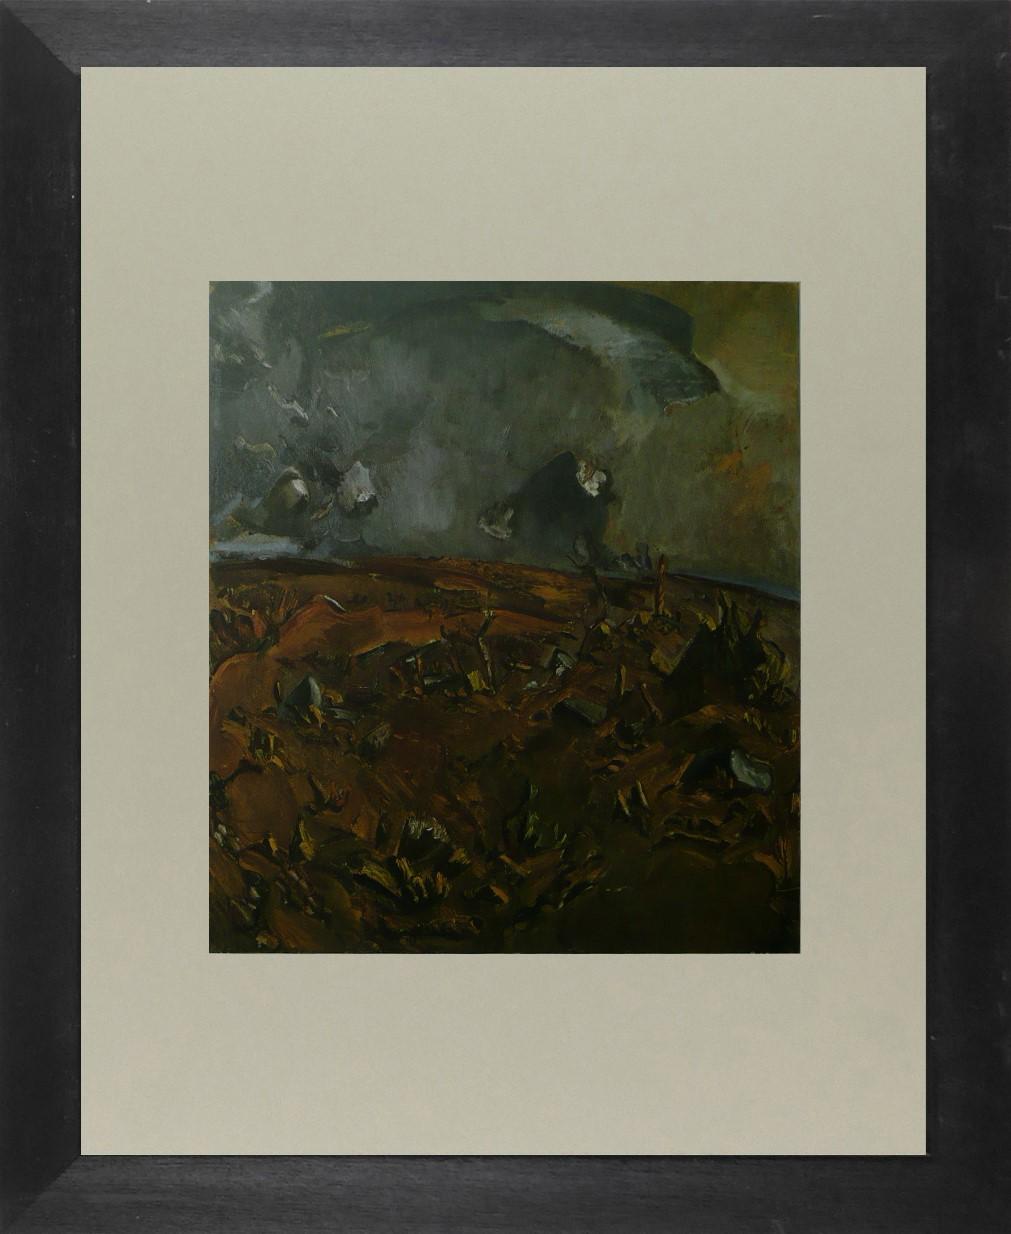 Landscape - Vera Nilsson - Framed Picture 11 x 14